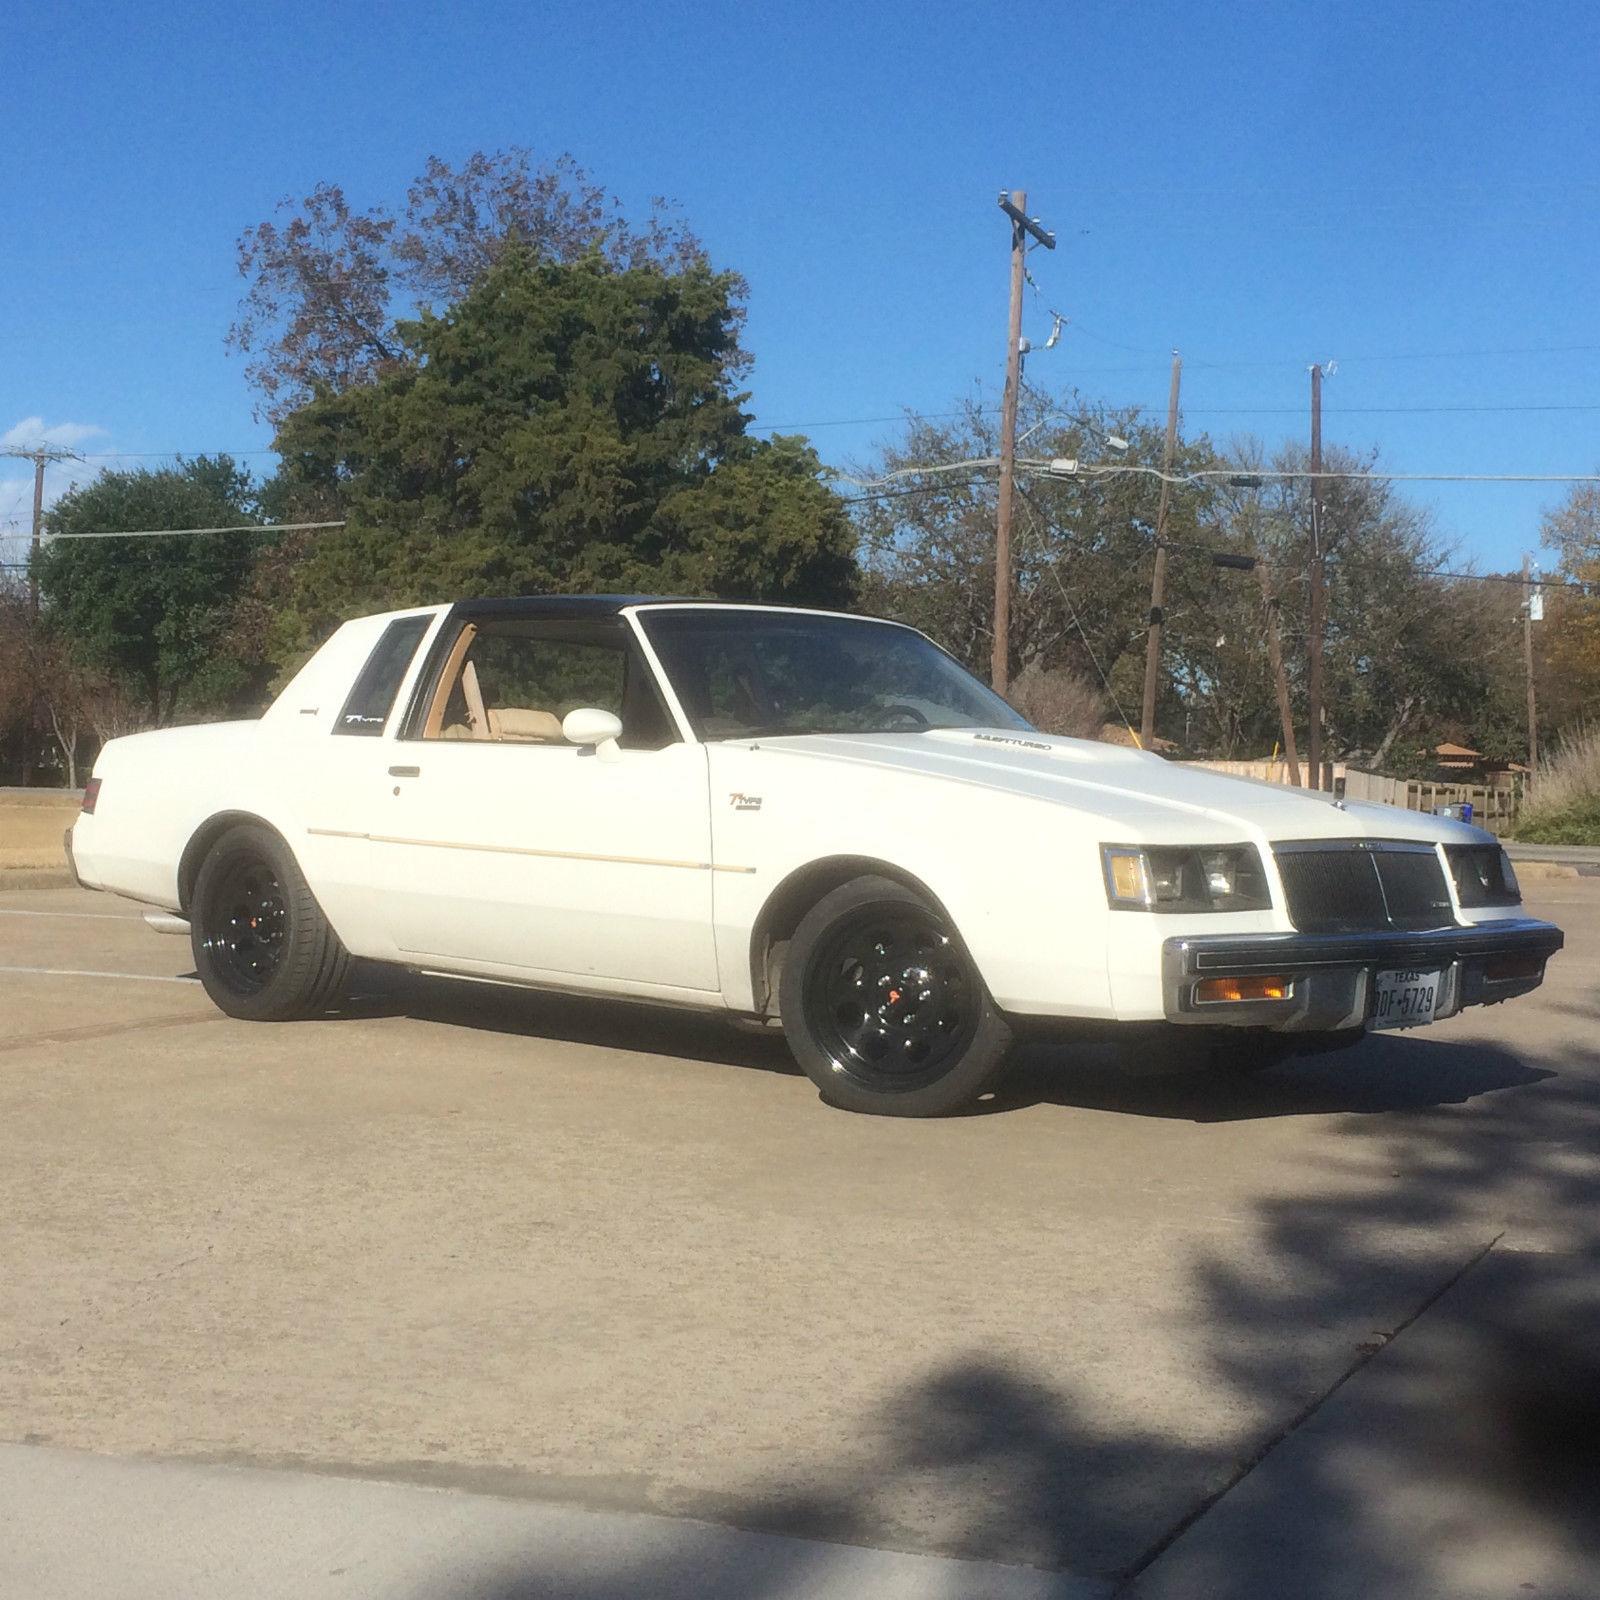 Dallas Buick: 1986 Buick Regal T-Type Coupe 2-Door 3.8L